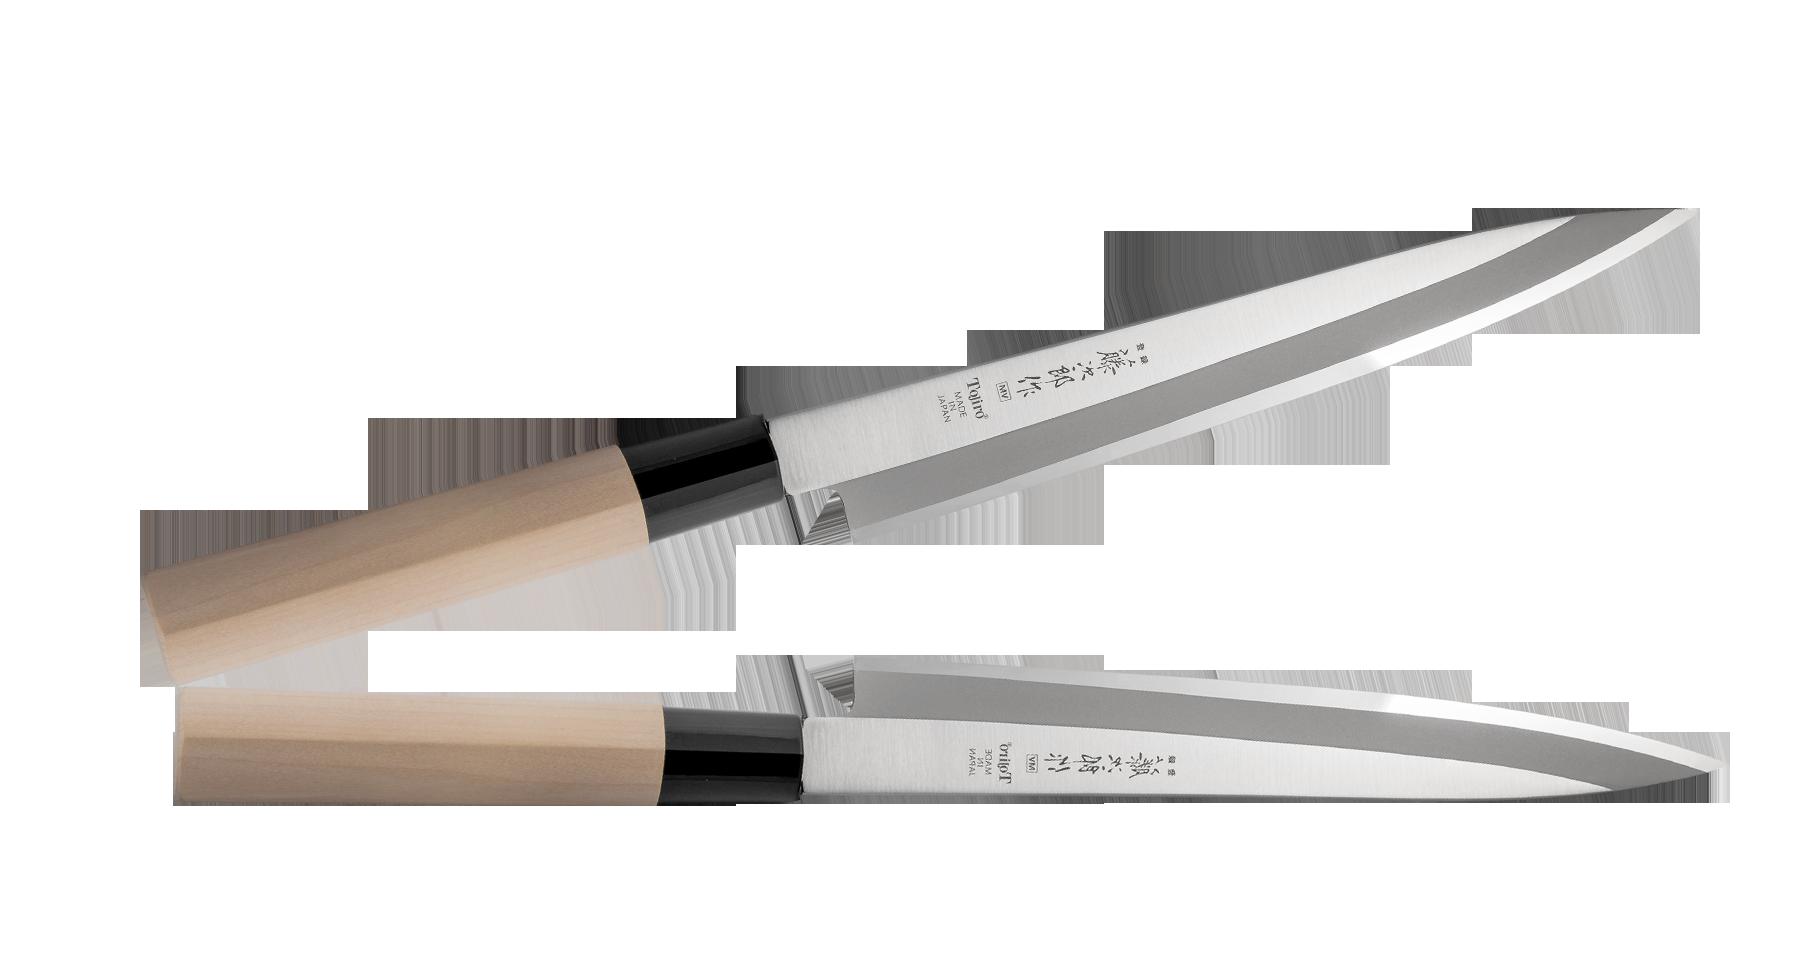 Фото 2 - Нож Янаги Japanese Knife, Tojiro, 200 мм, сталь AUS-8